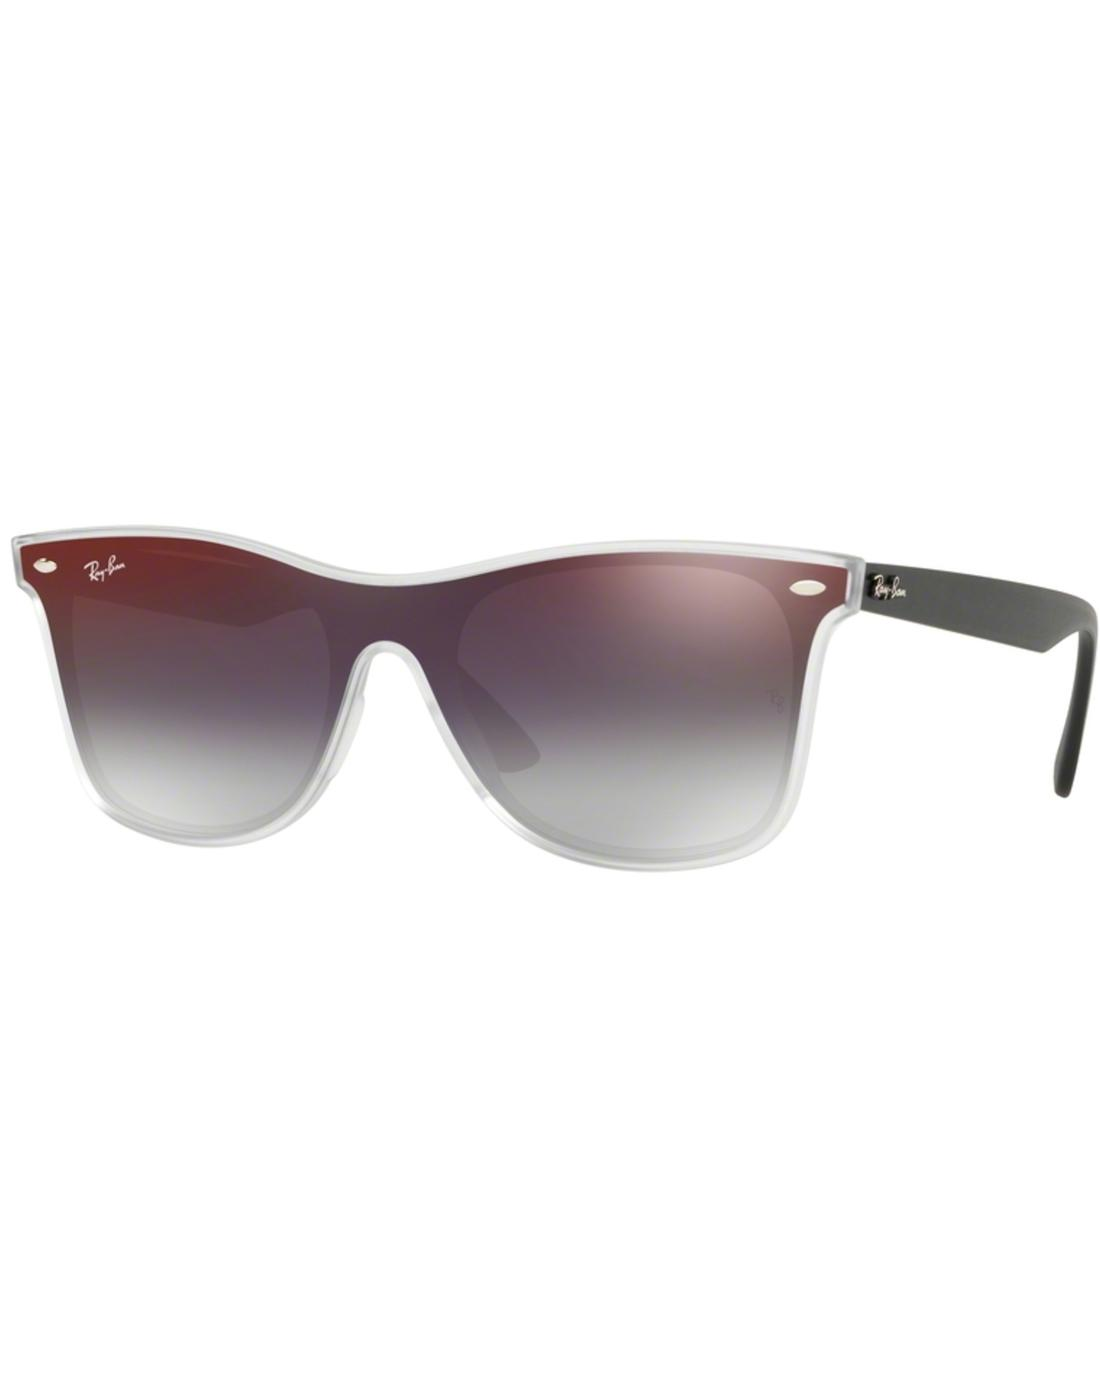 Blaze Wayfarer RAY-BAN Mirror Lens Sunglasses Red